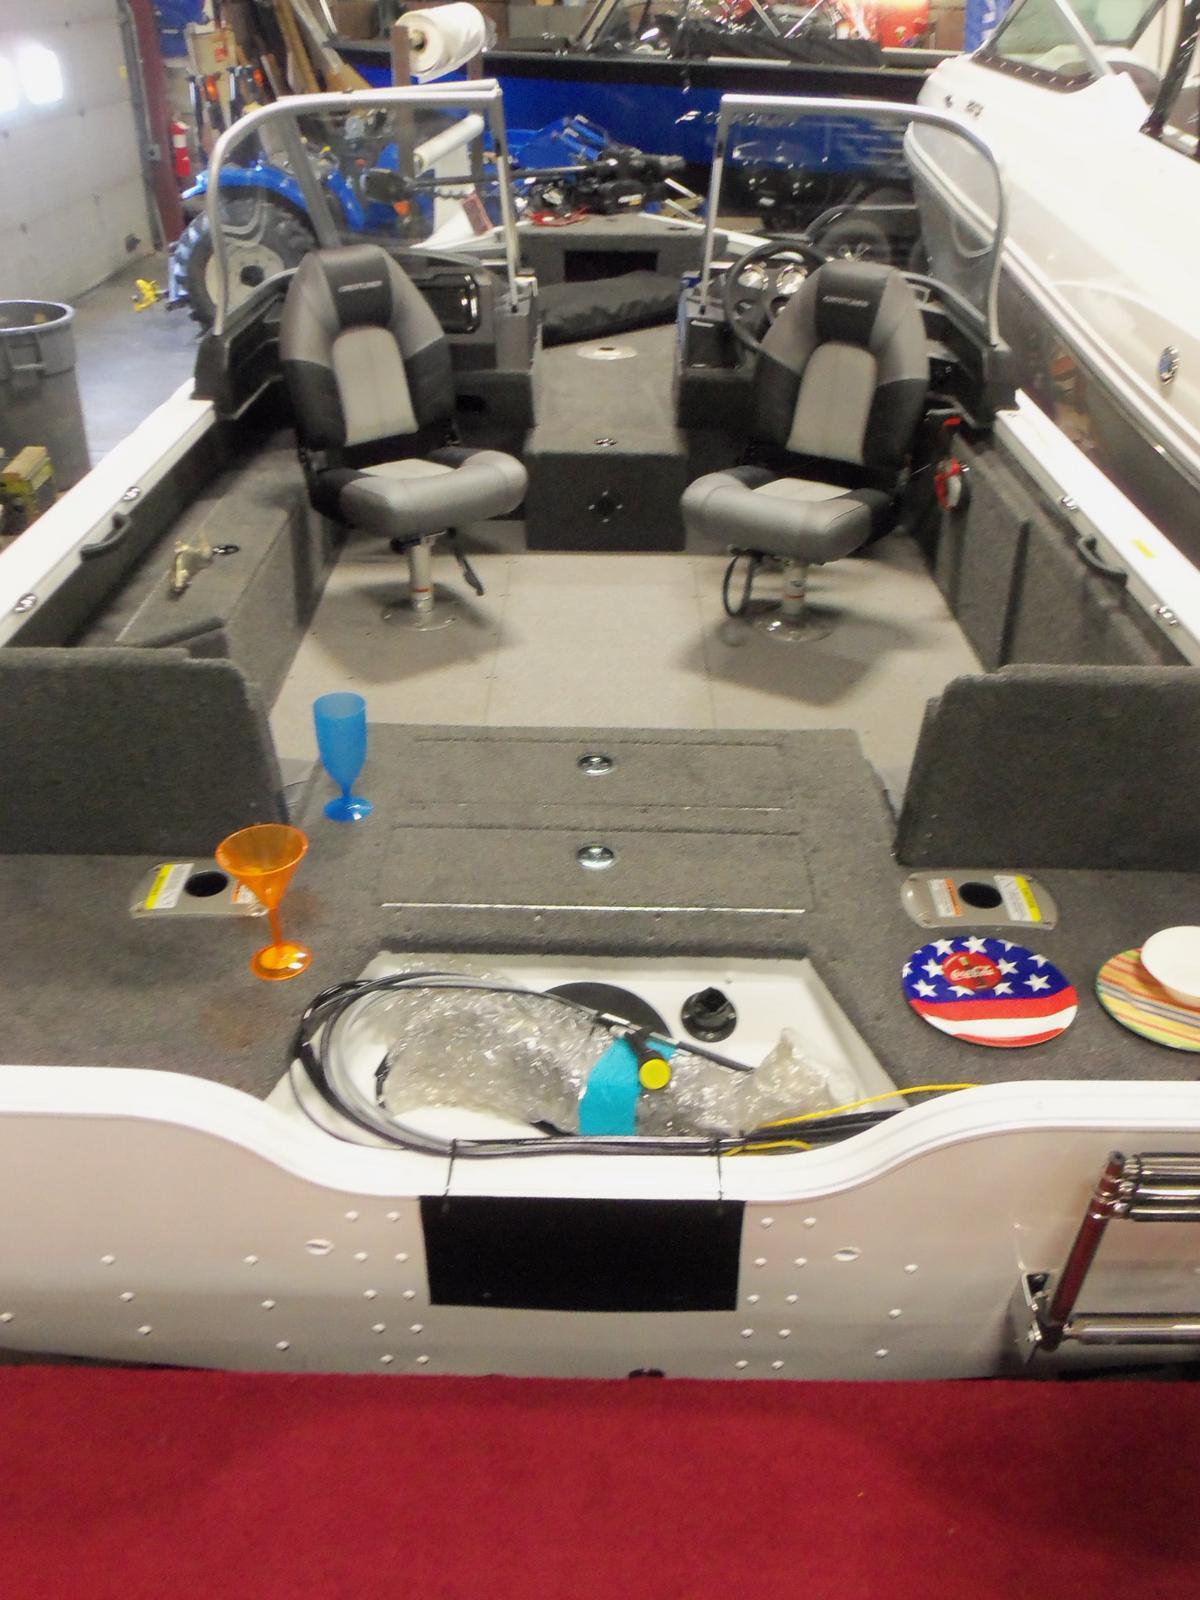 2020 Crestliner boat for sale, model of the boat is 1850 Fish Hawk Walk-through JS & Image # 7 of 28